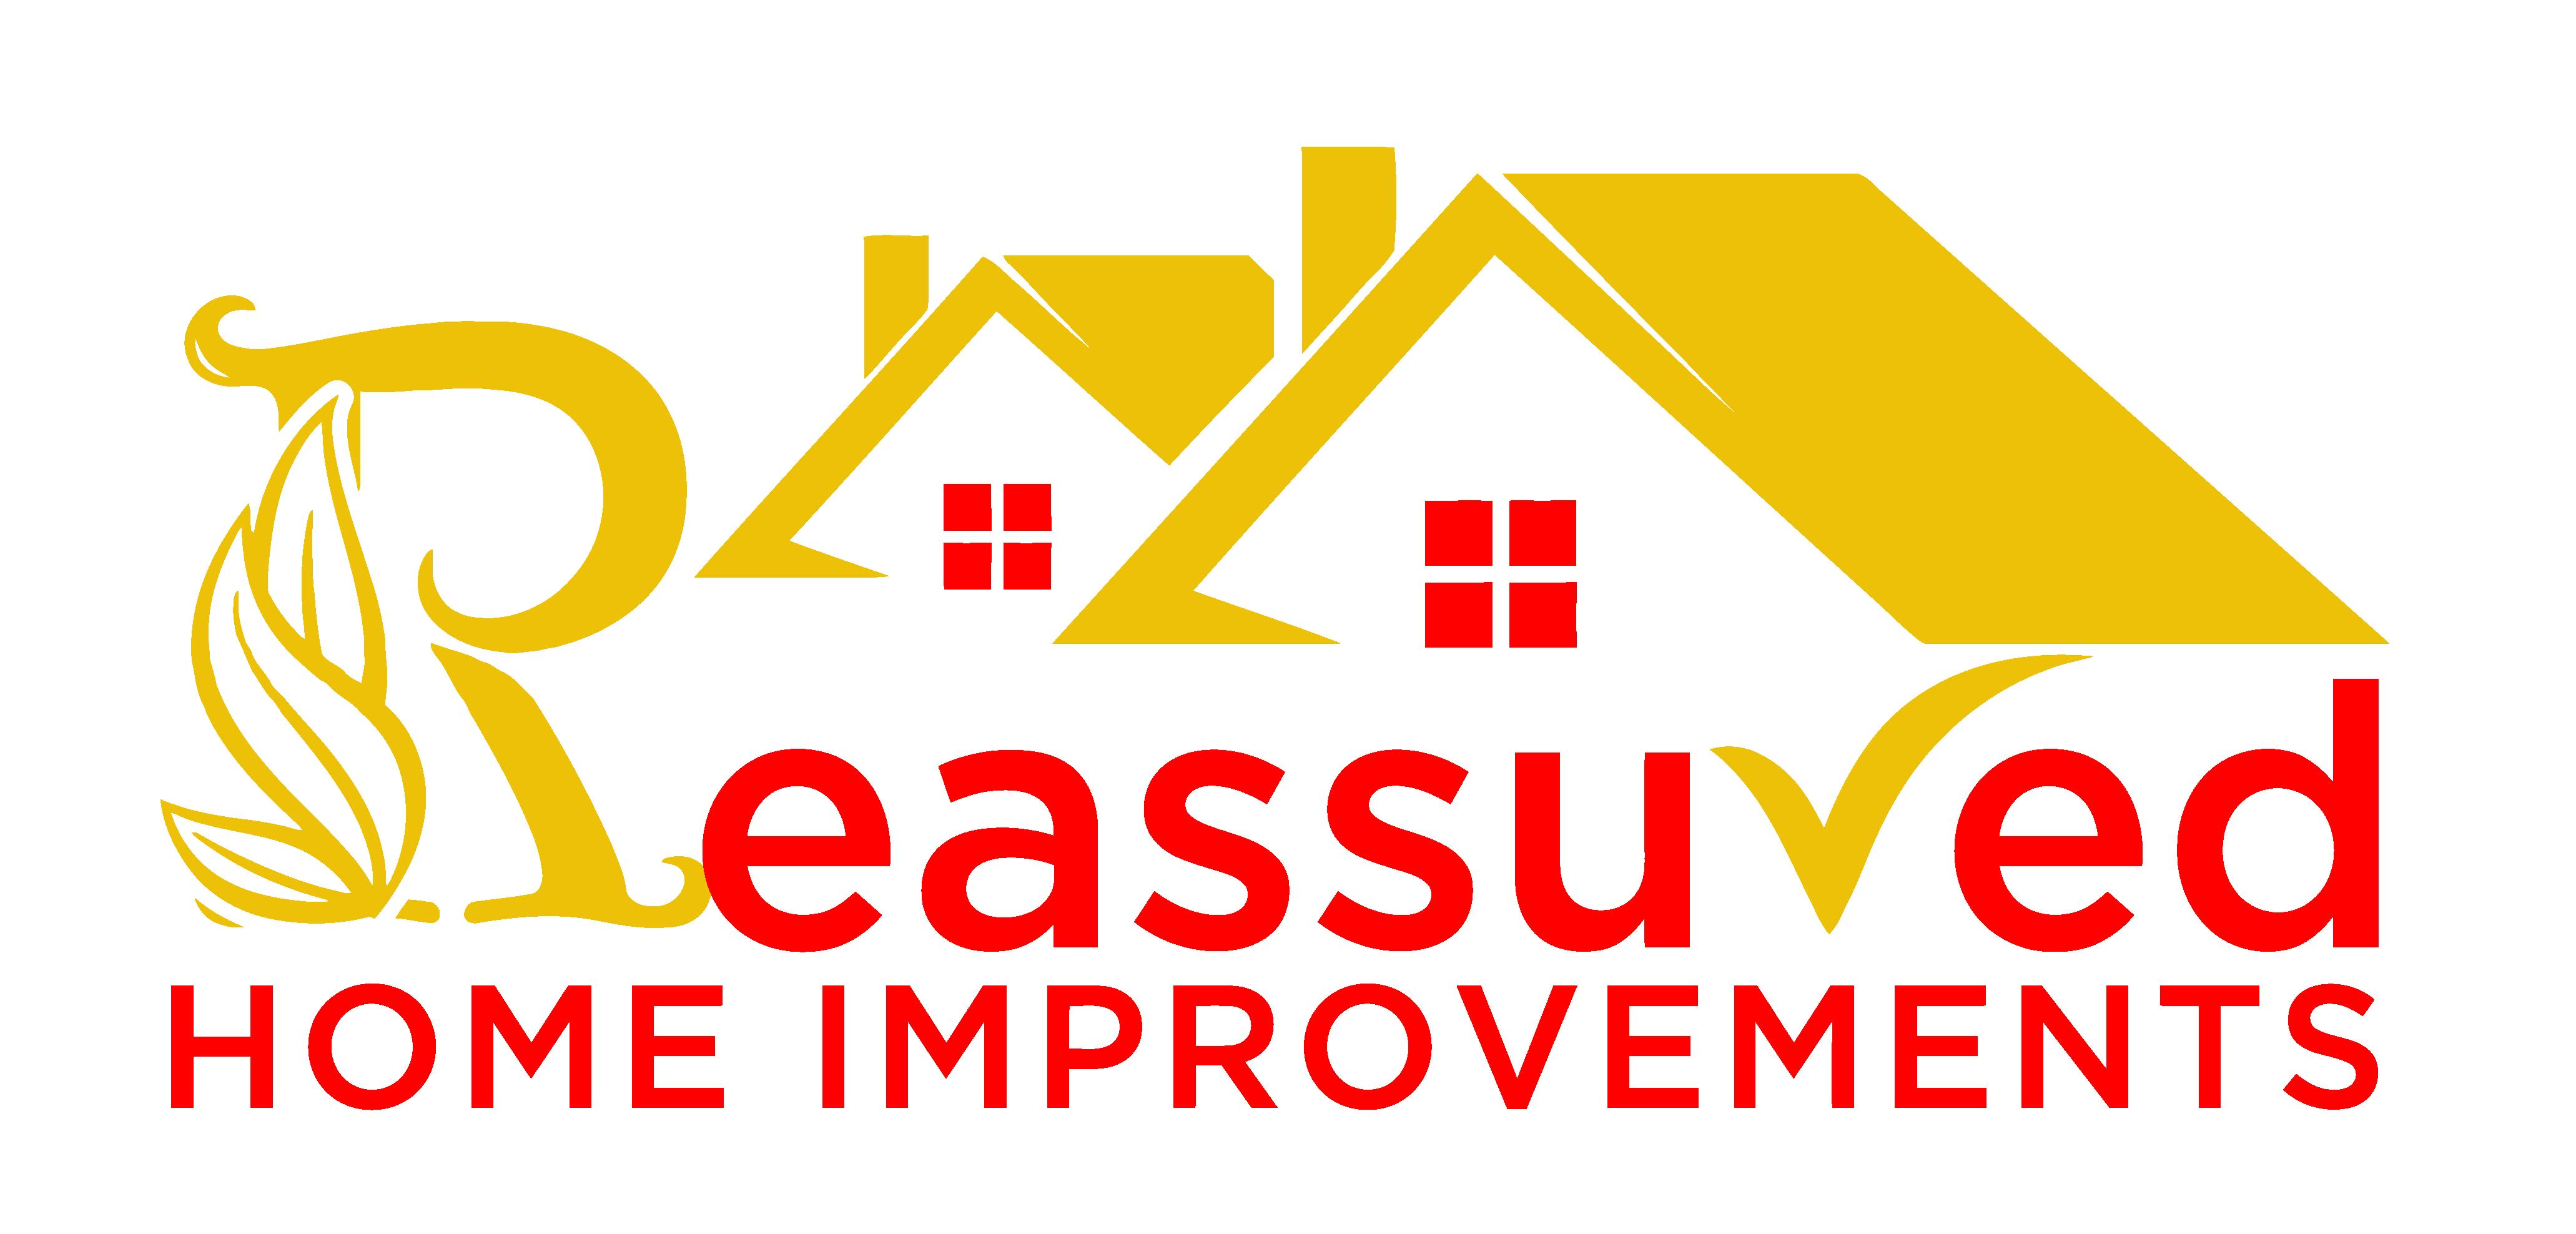 Reassured Home Improvements